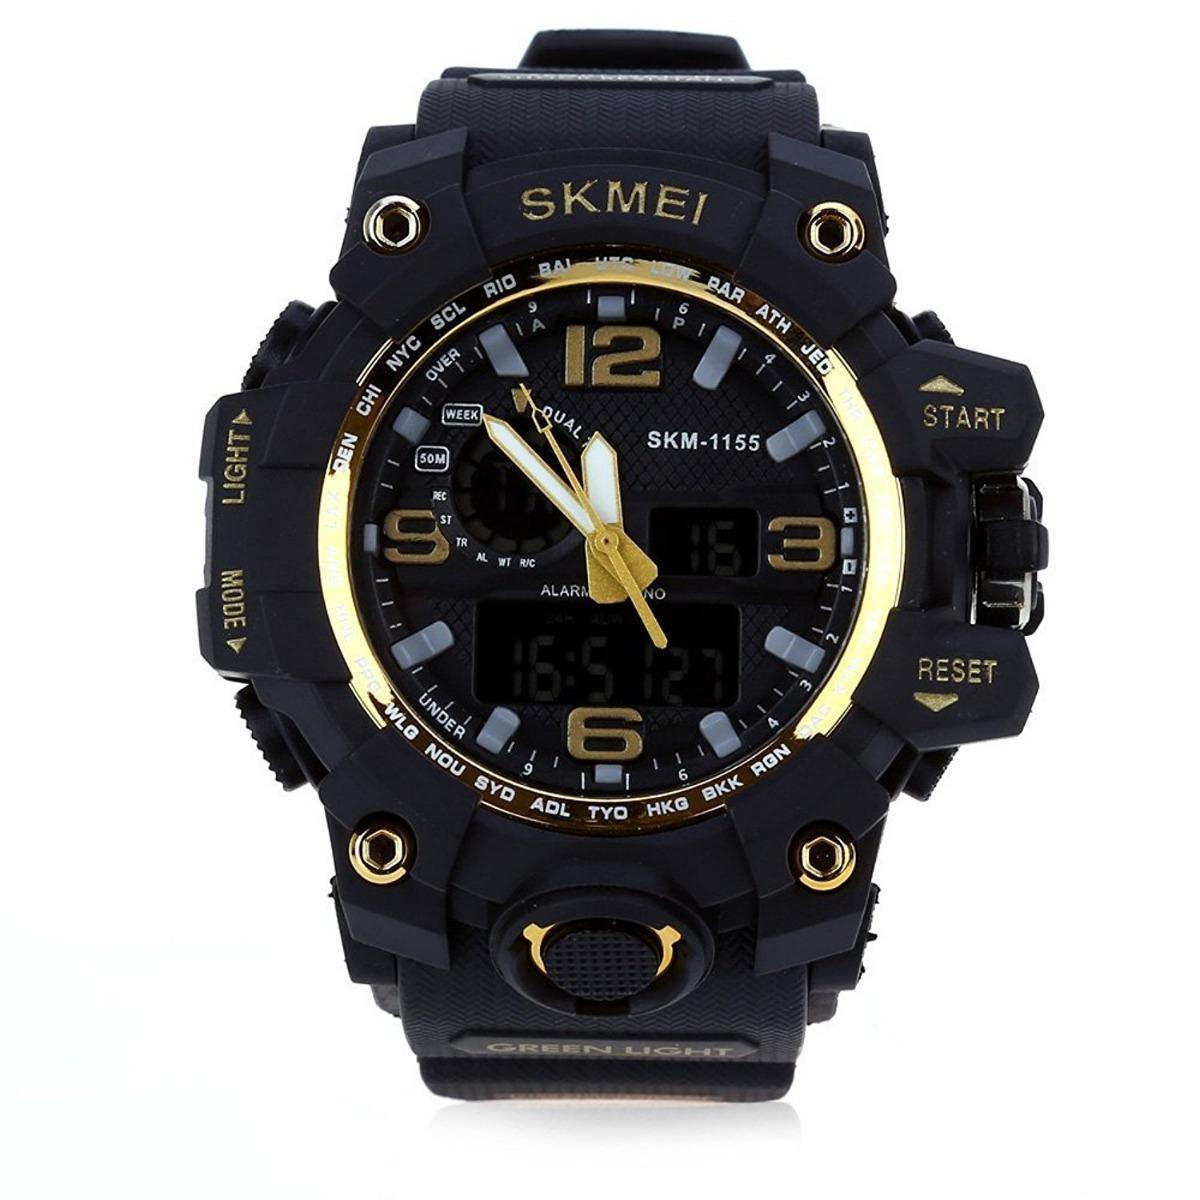 38d3ddd563f relógio masculino digital quartz estilo g-shock militar. Carregando zoom.